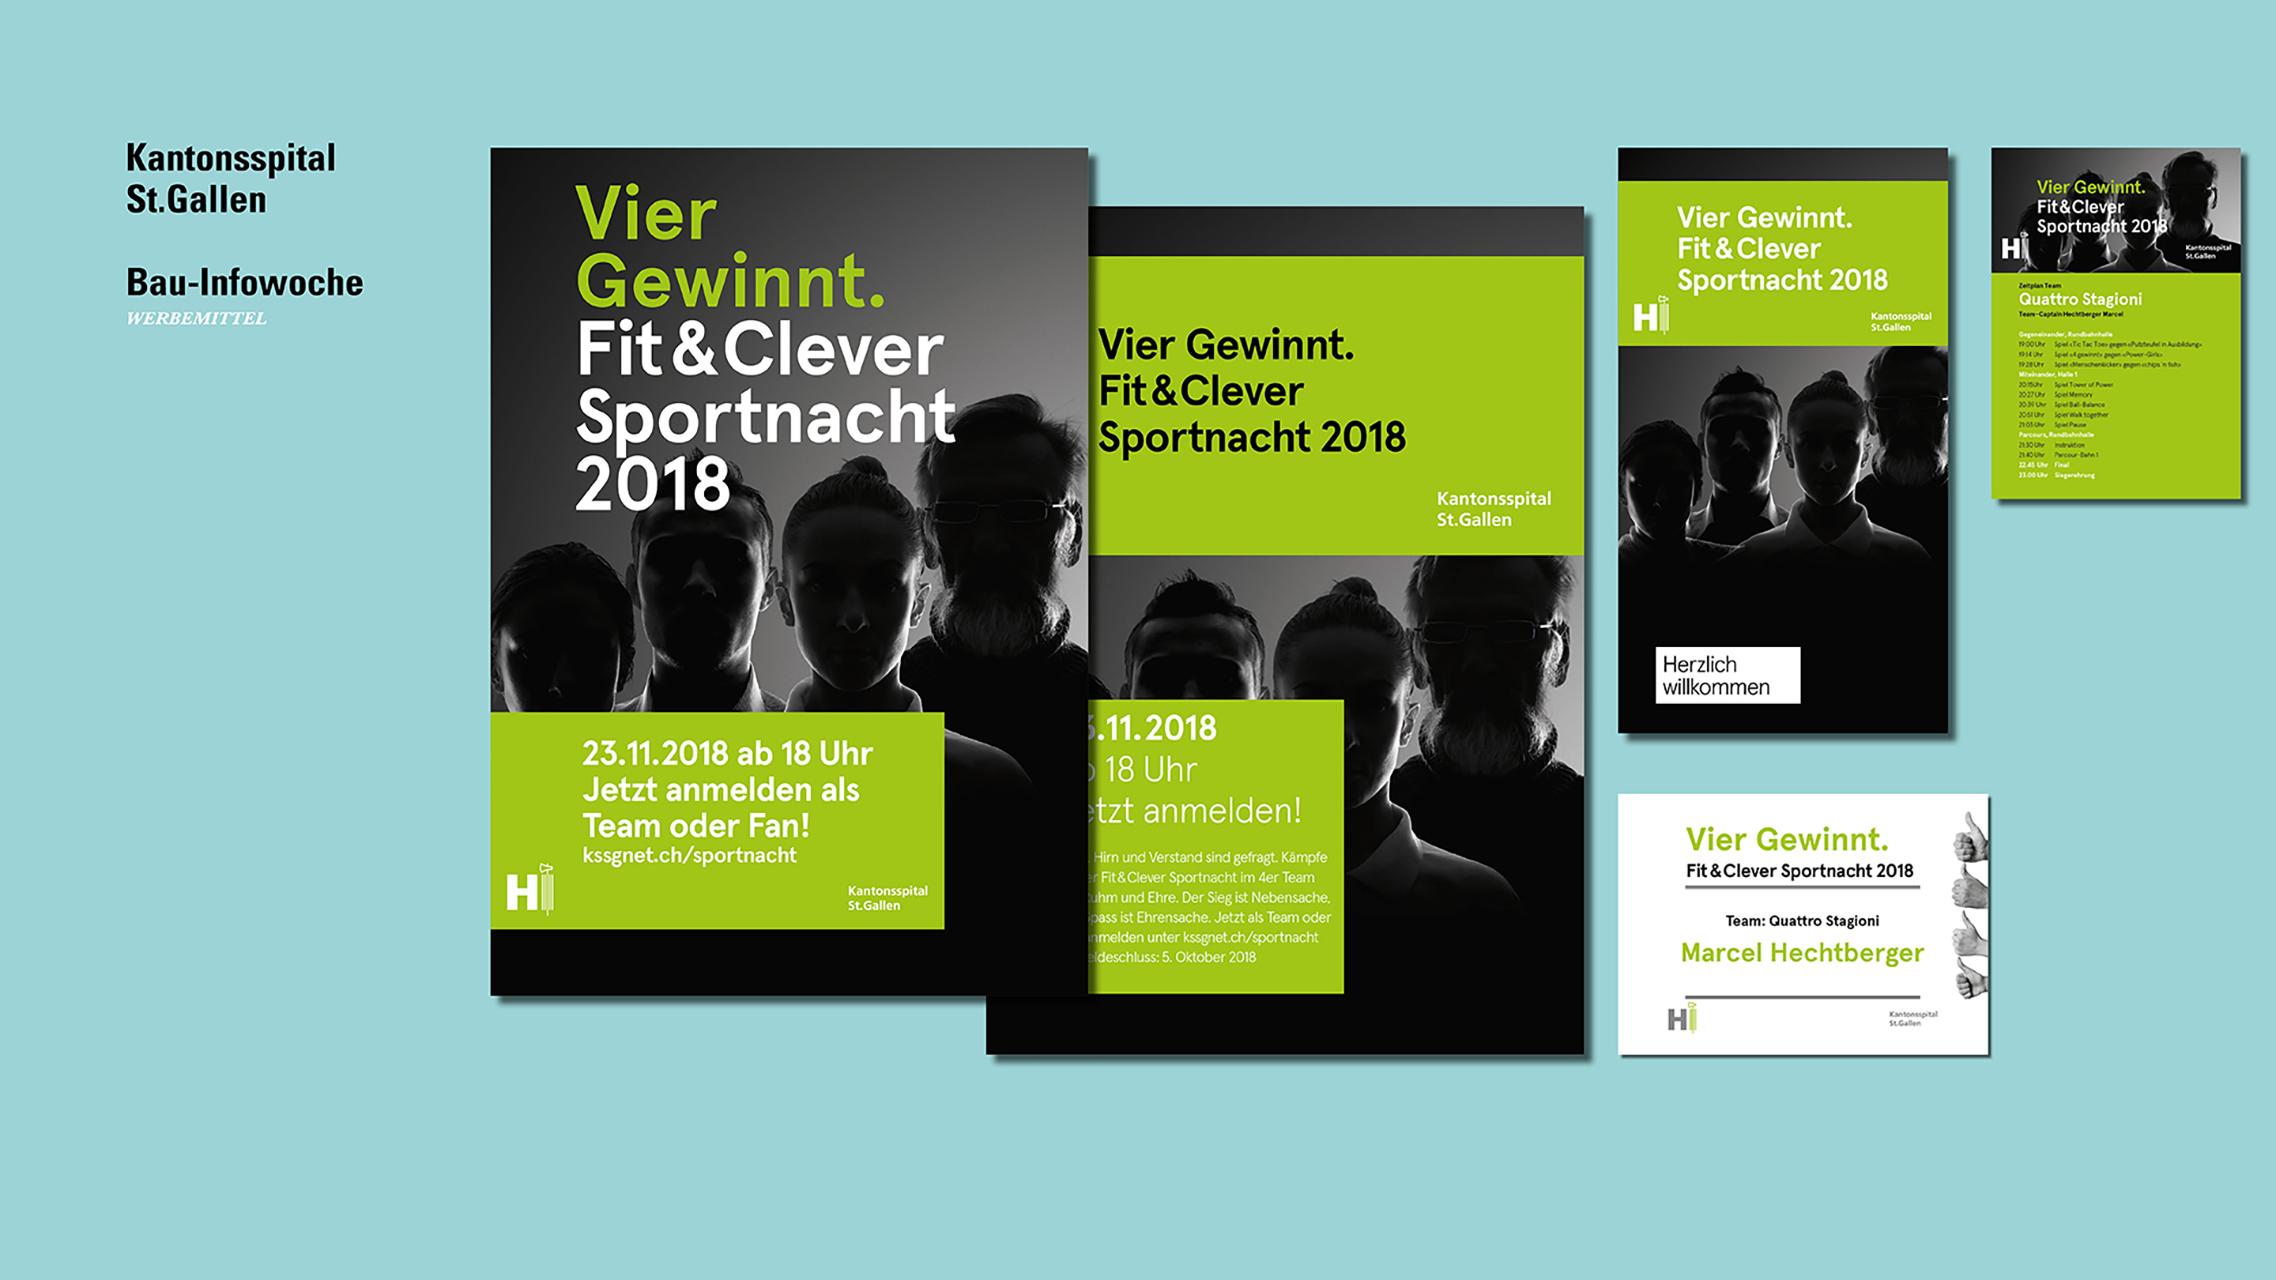 KSSG_Sportnacht_Werbemittel.jpg